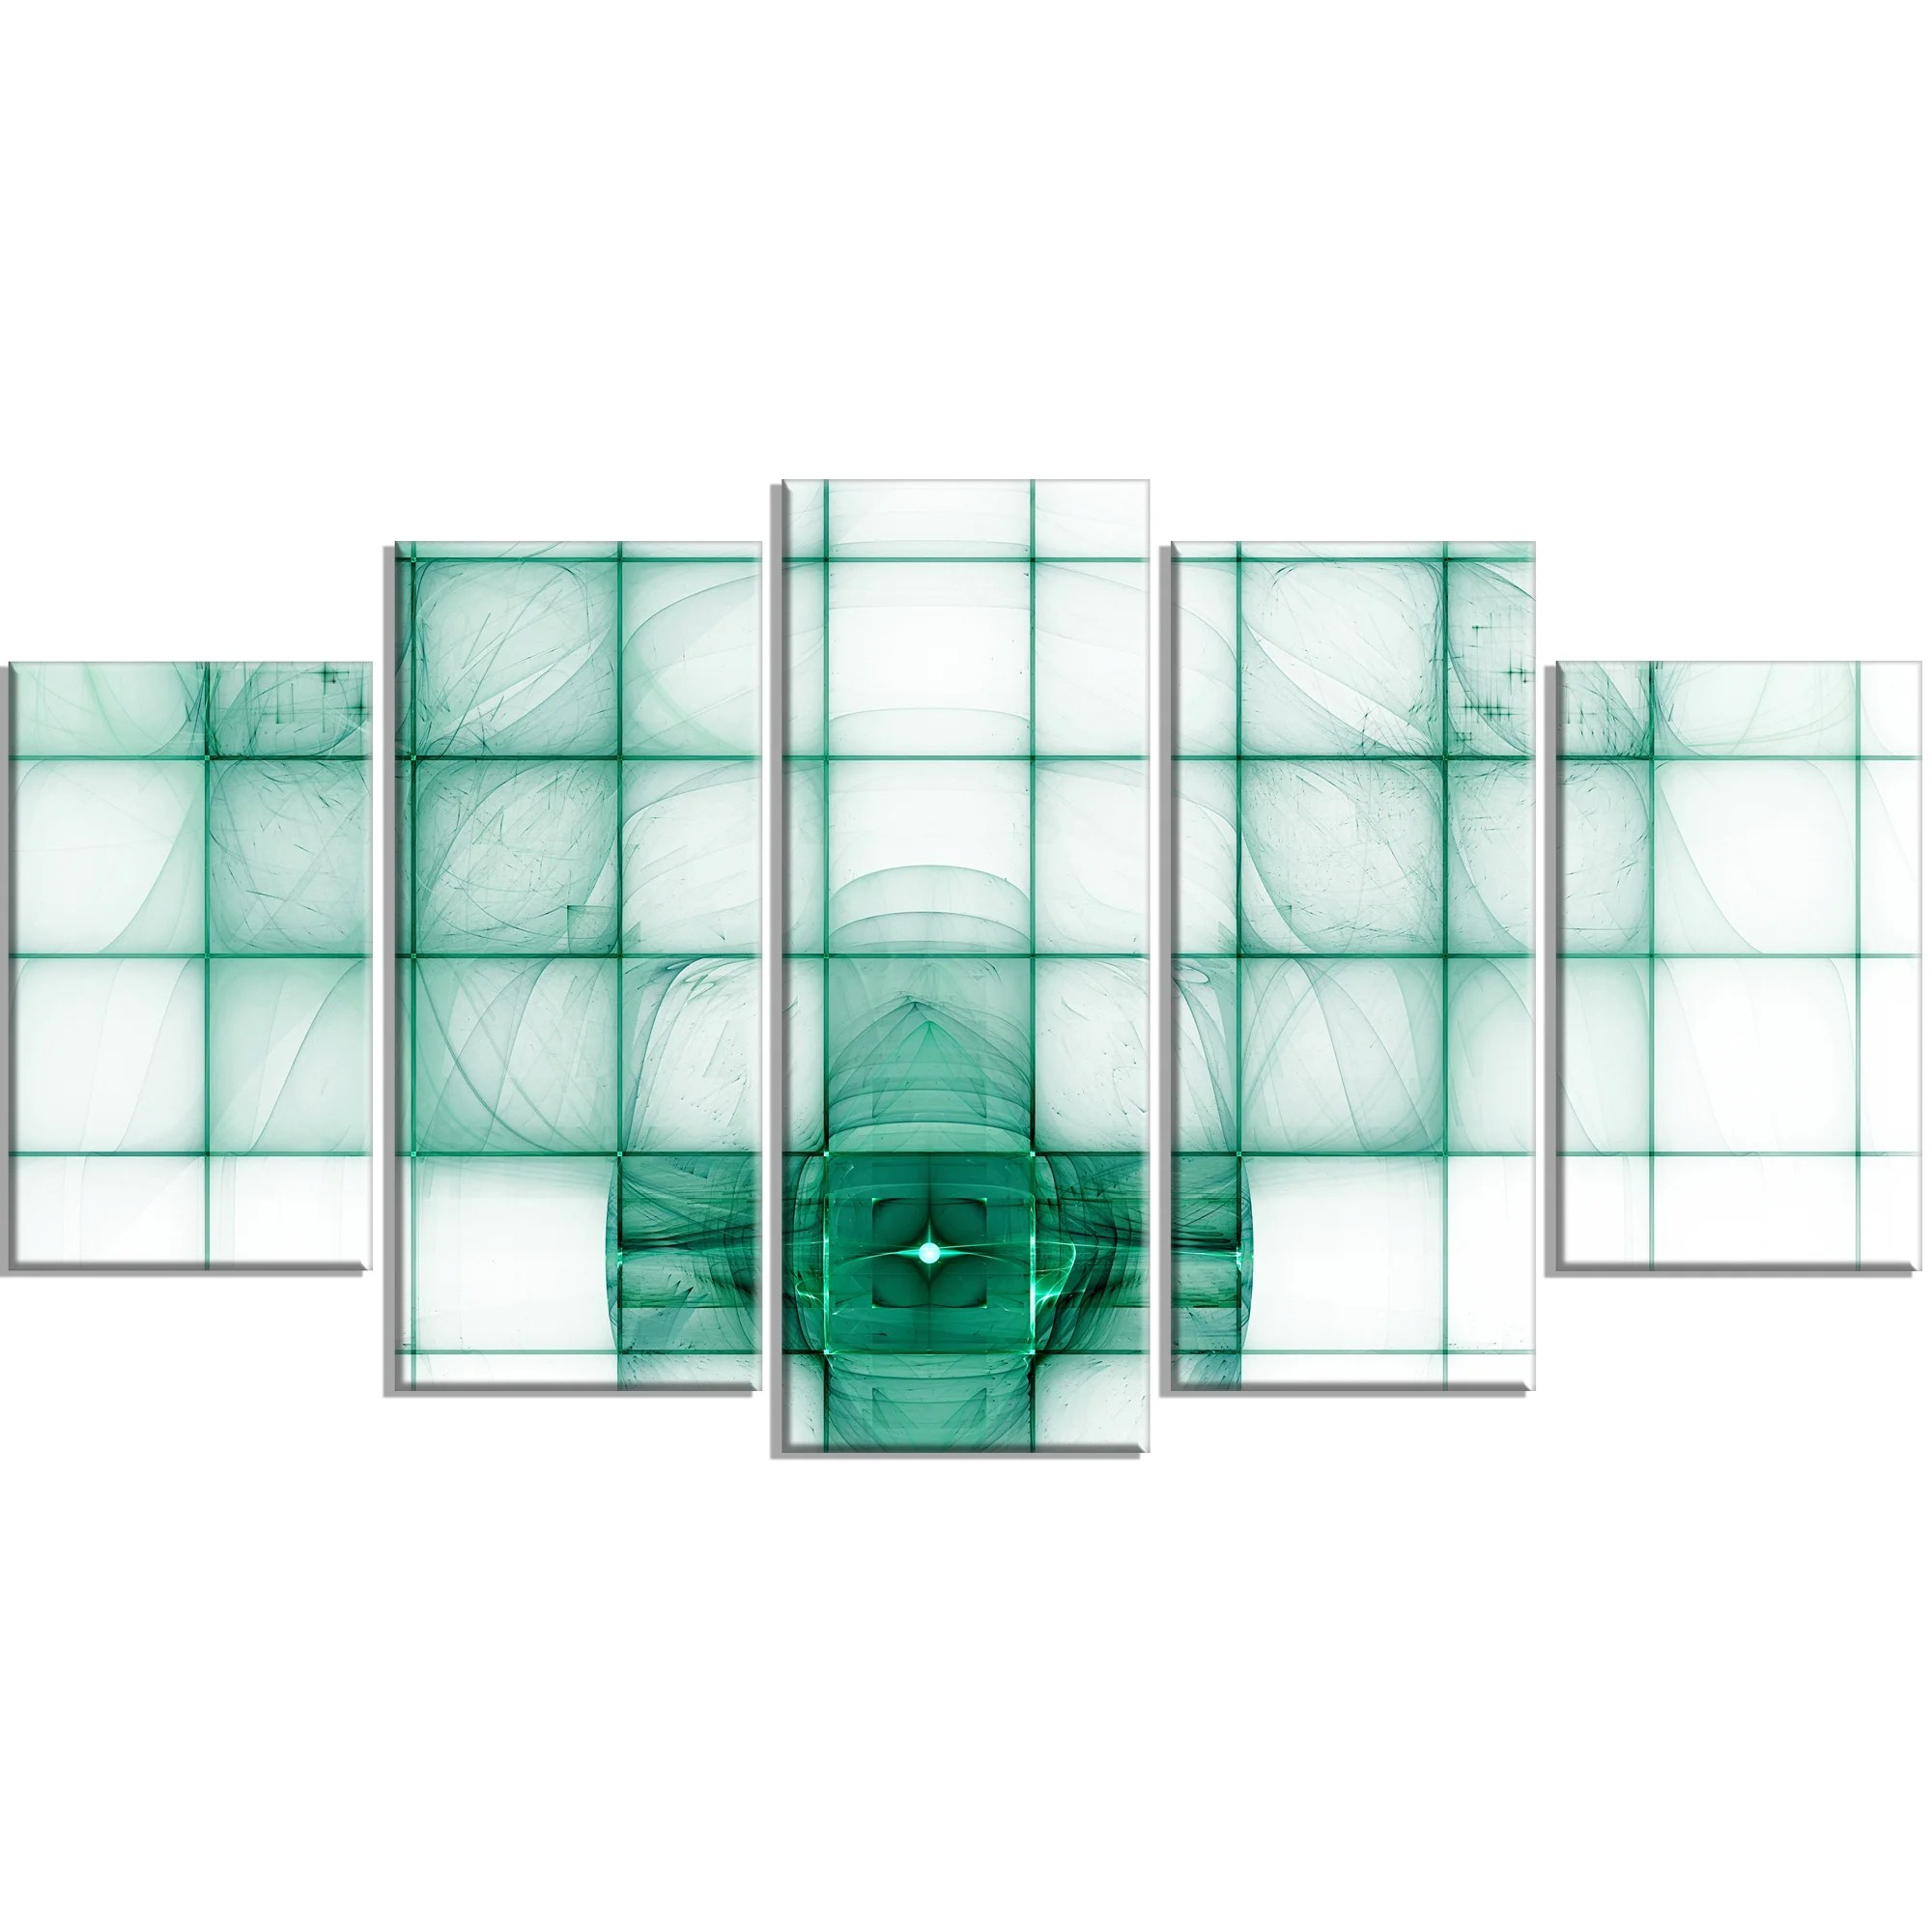 Designart Light Blue Bat On Radar Screen Graphic Art